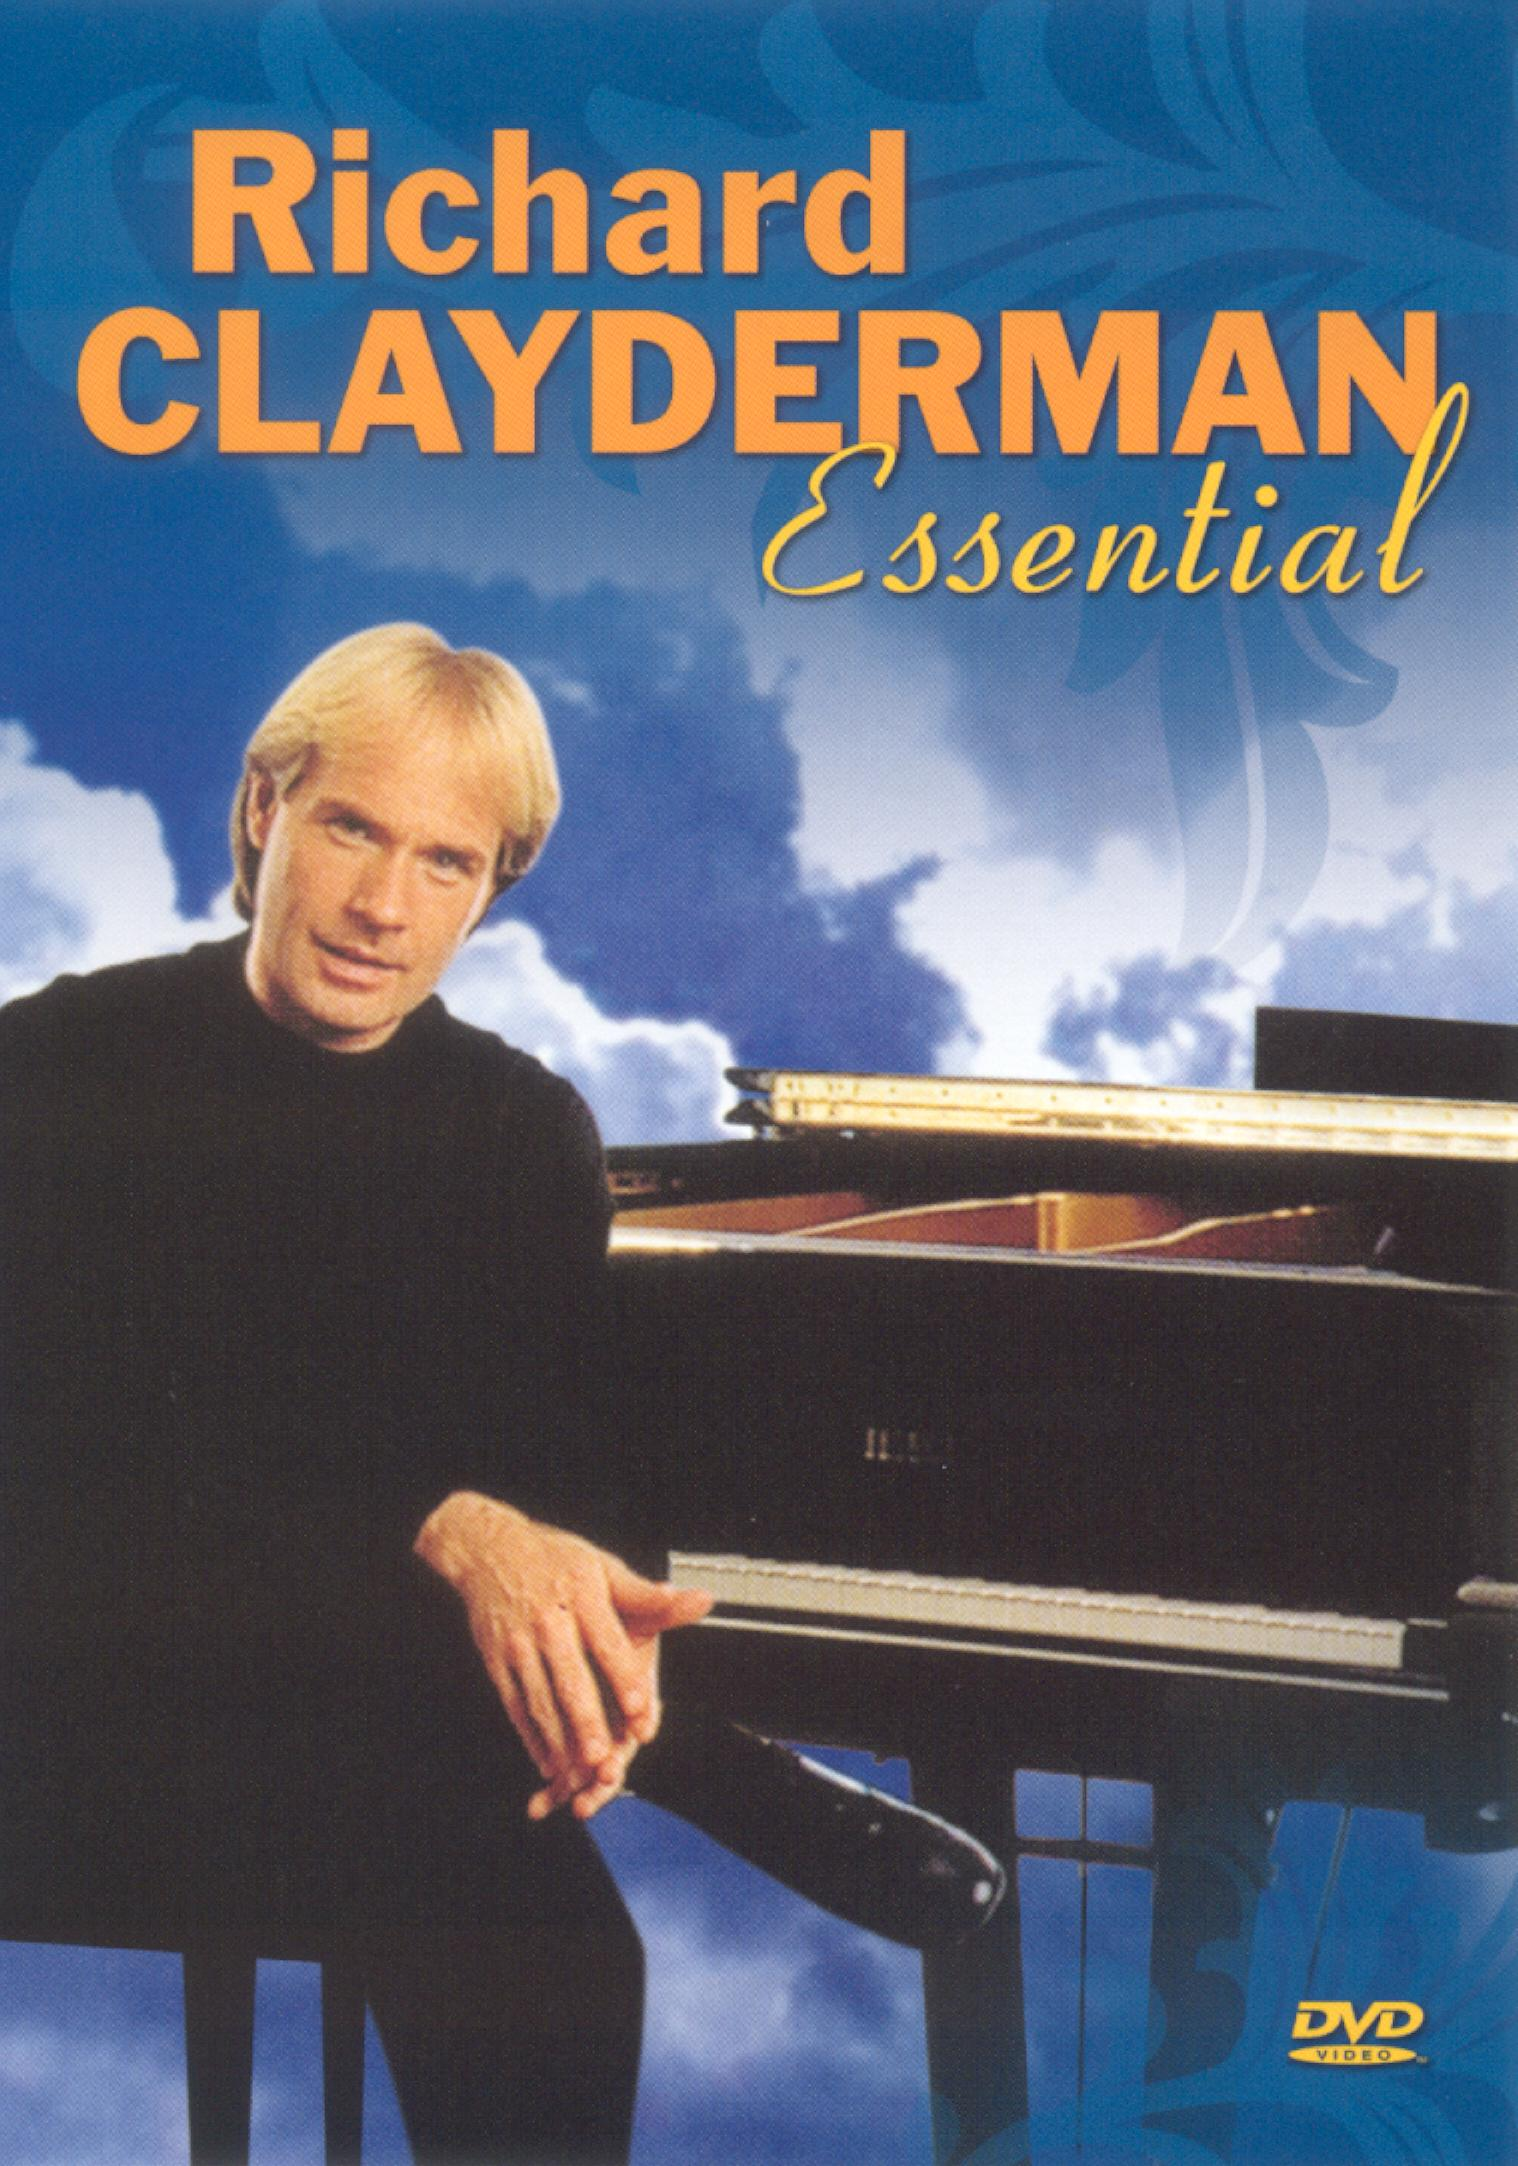 Richard Clayderman: Essential